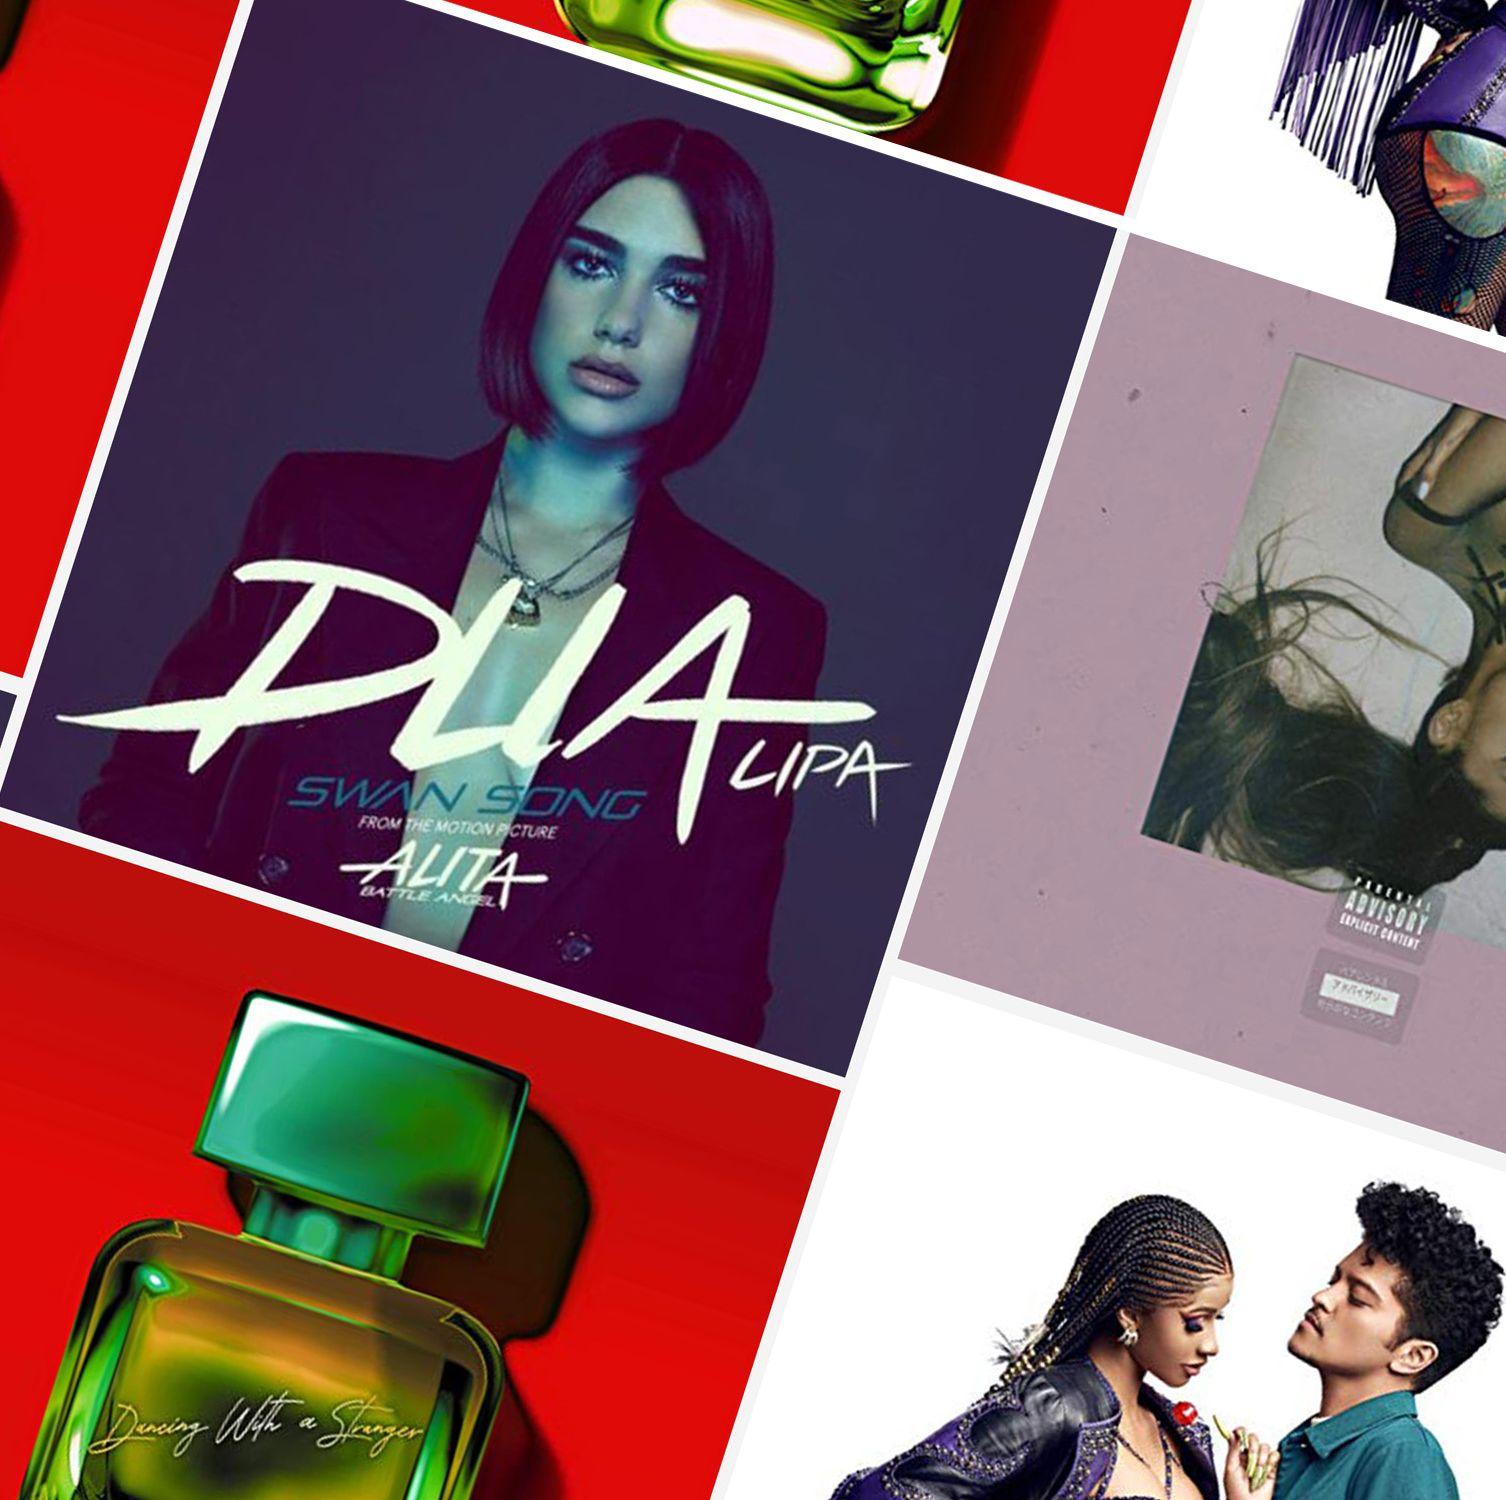 The Best Pop Songs of 2019 So Far